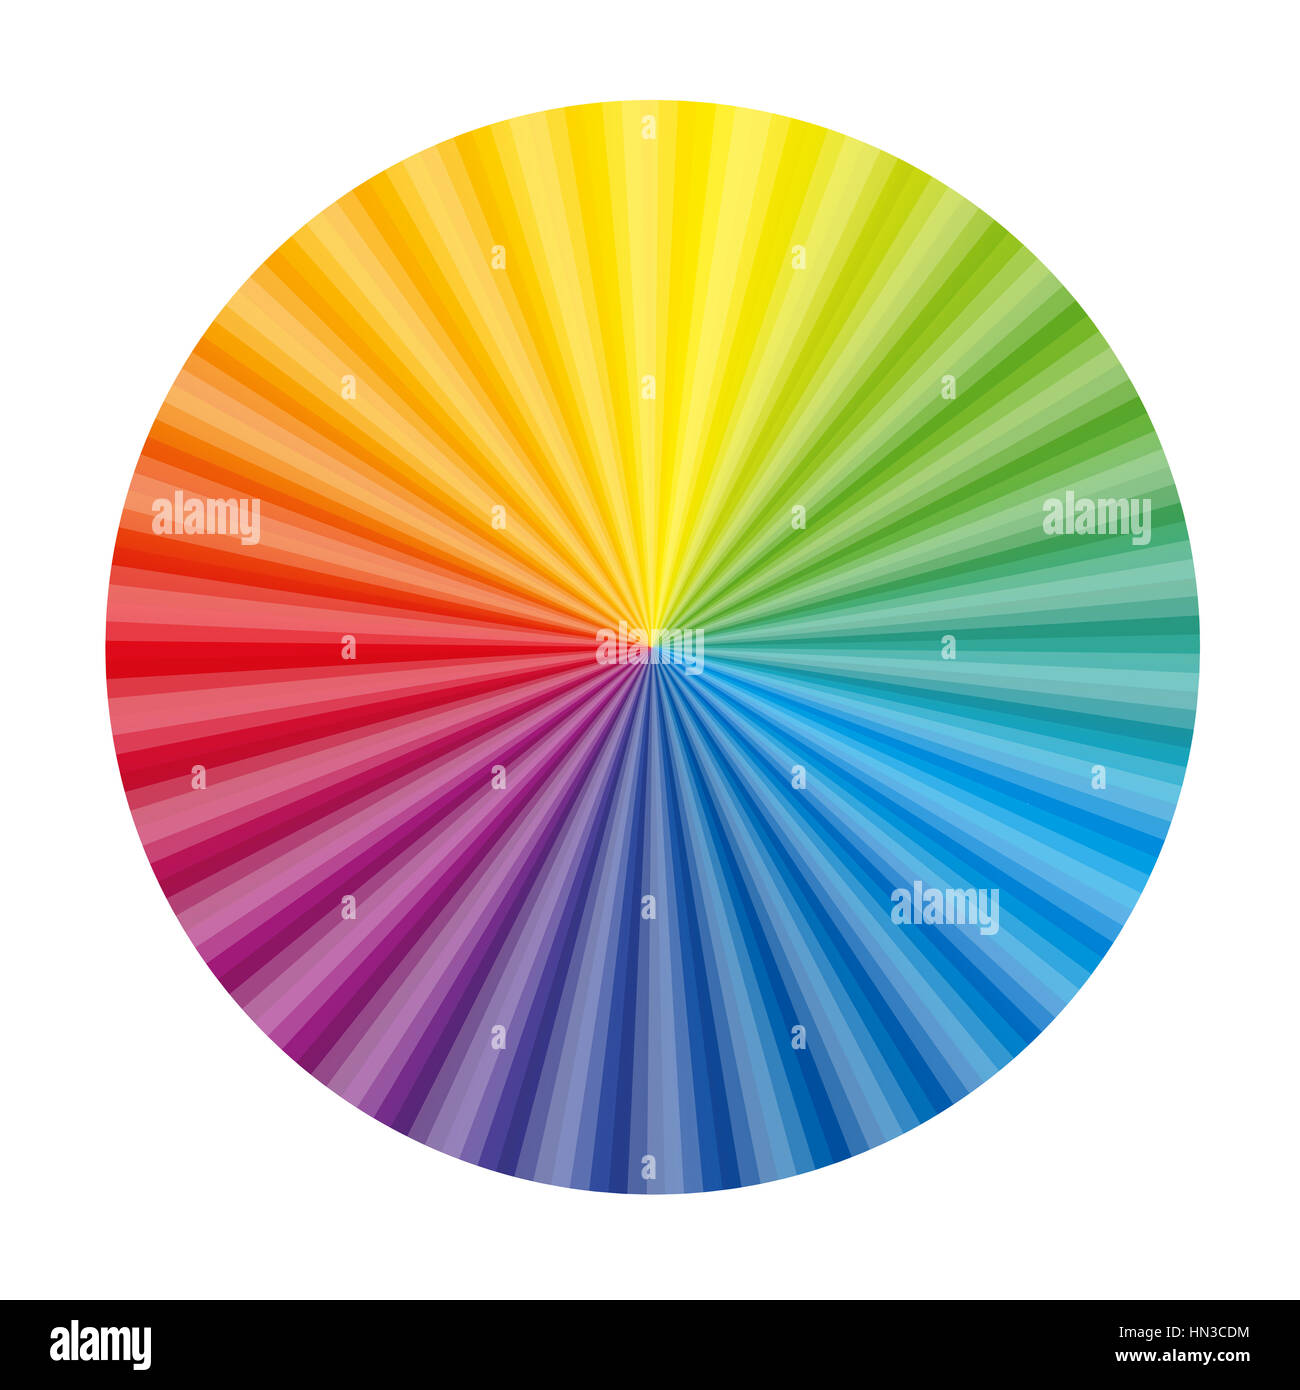 Circular color gradient chart fan stock photo royalty free image circular color gradient chart fan nvjuhfo Images